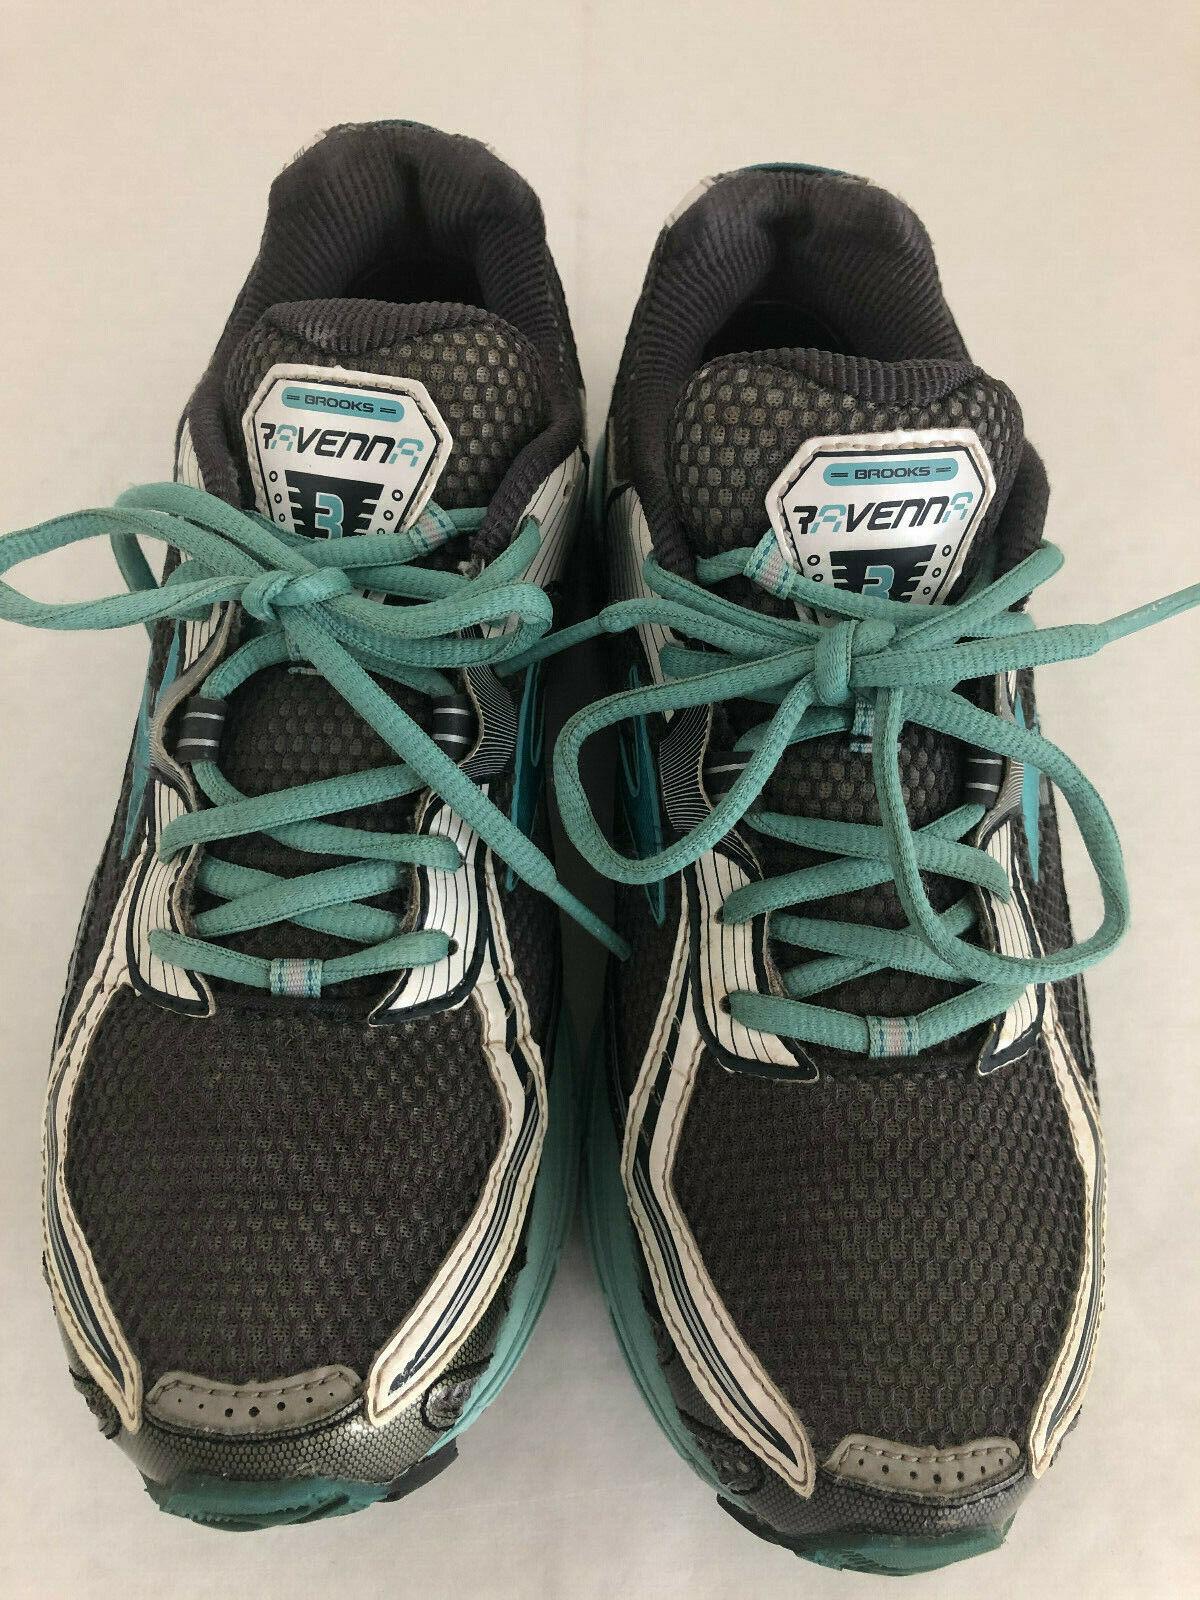 Women's BROOKS RAVENNA 3 Mint Green Running shoes Sneakers Size 9.5 B US 41 EUR